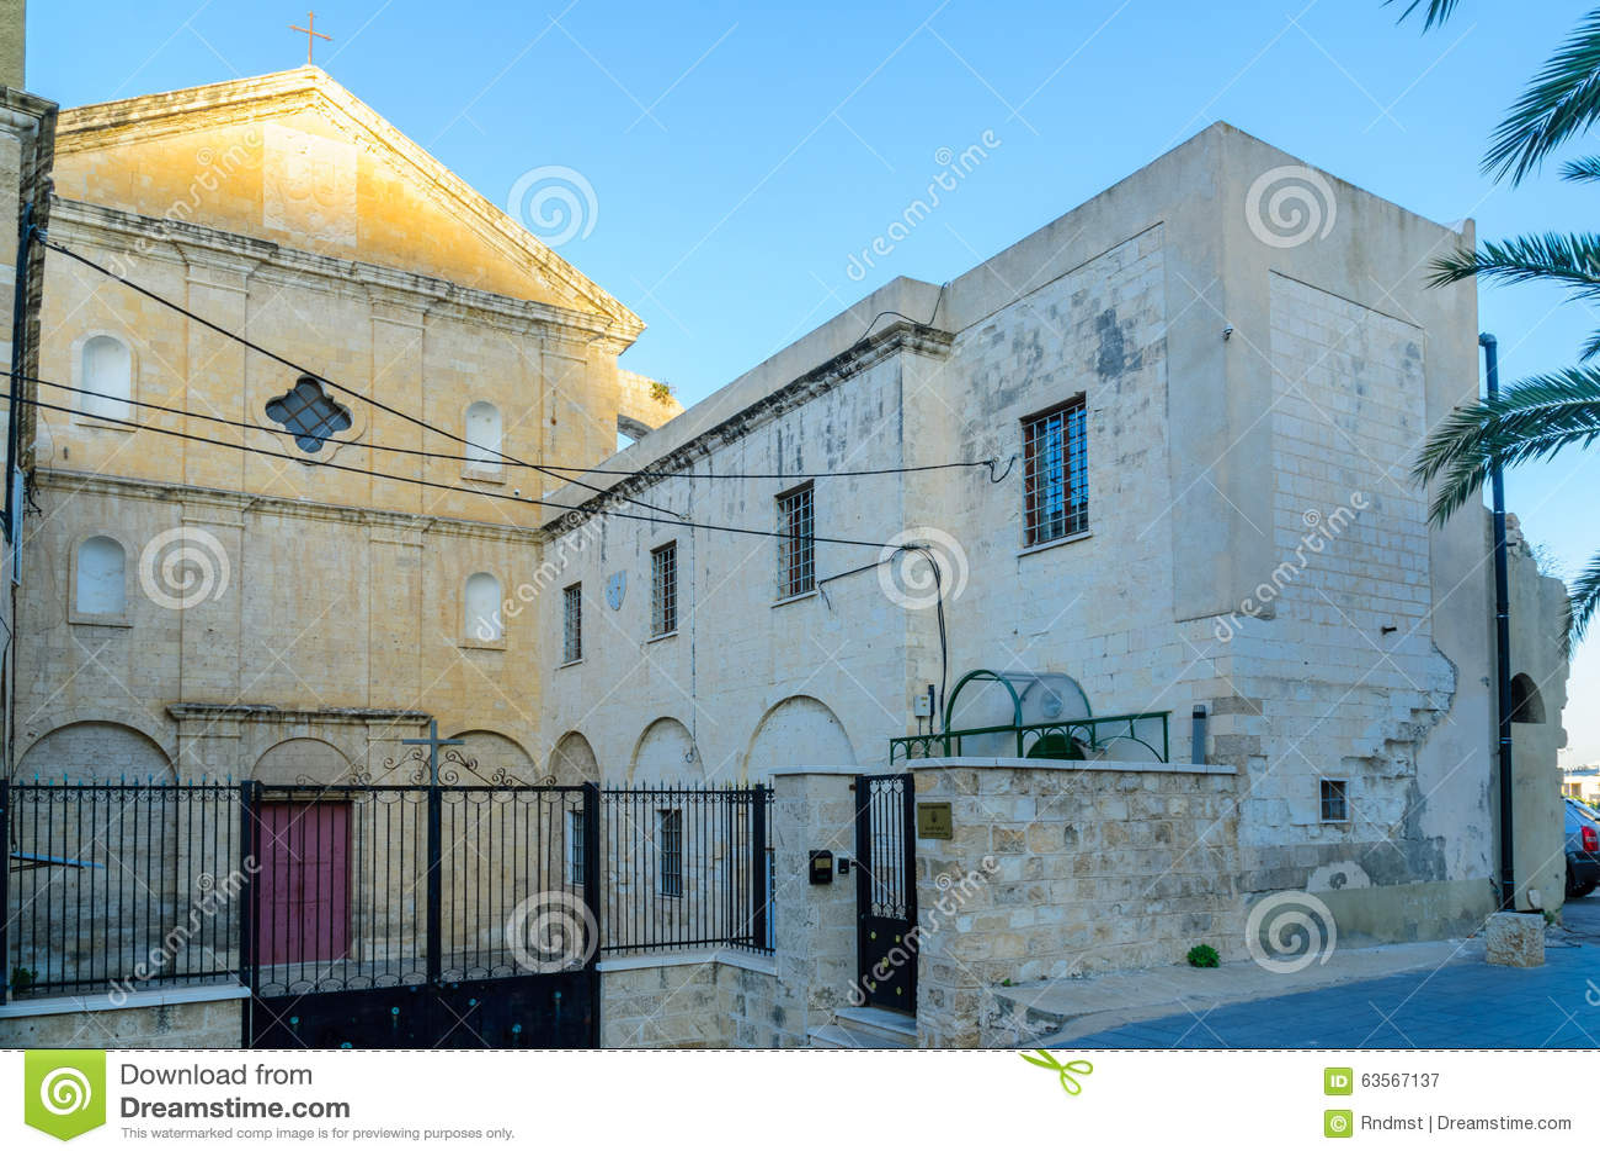 Carmelite Monastery, Haifa stock image  Image of cloister - 63567137